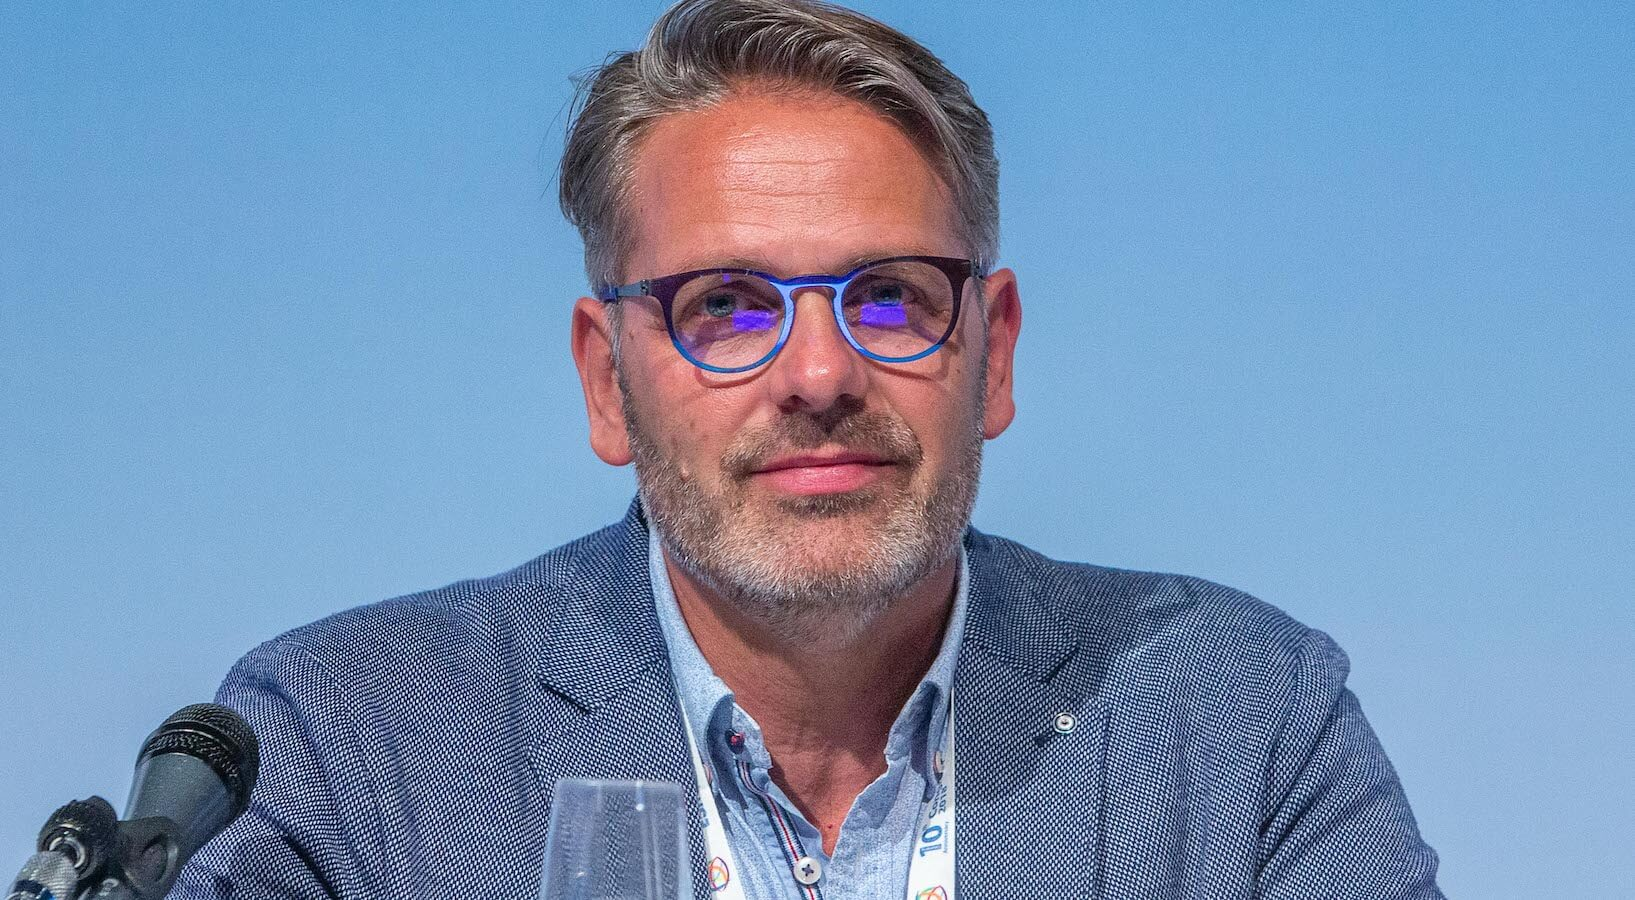 Patrick Brouwer, President of ESMINT.